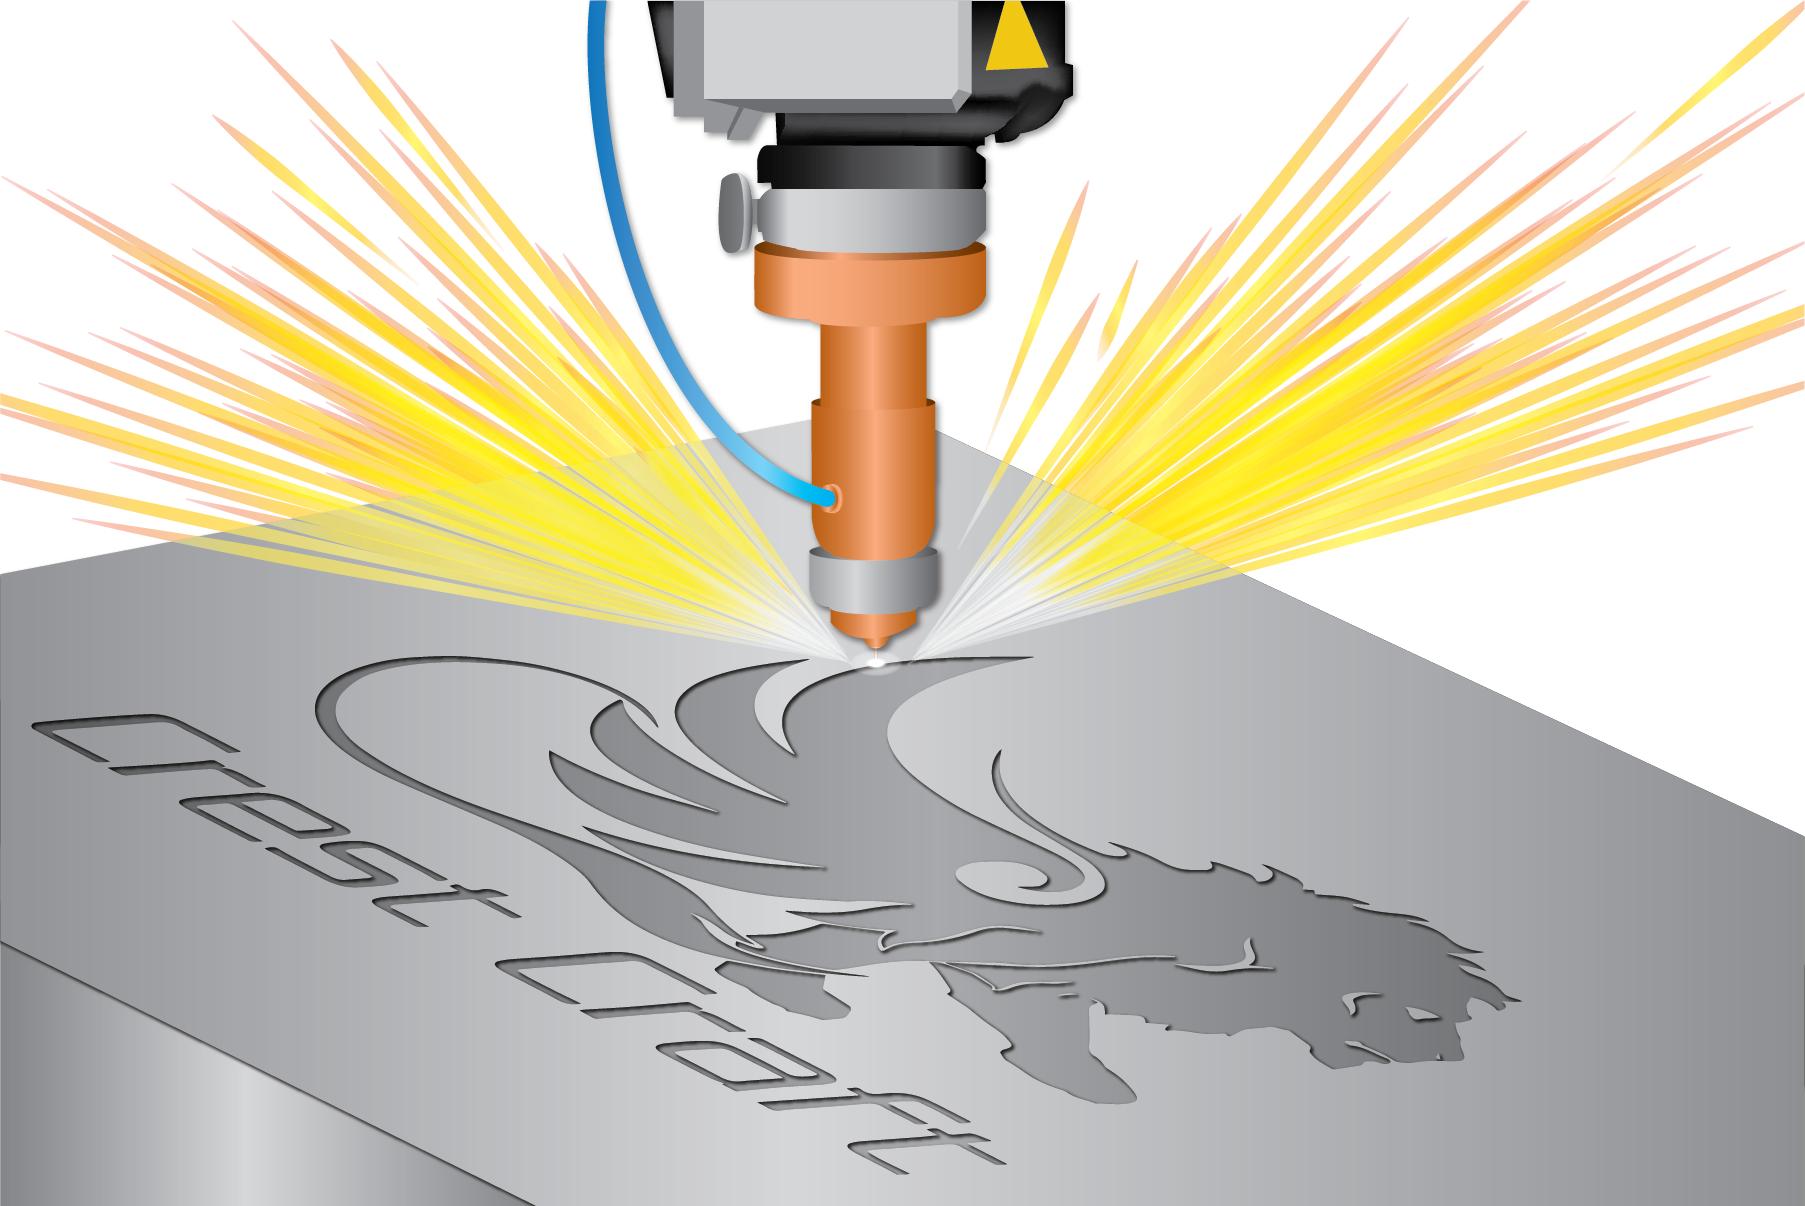 Illustration of Laser Engraving Metal